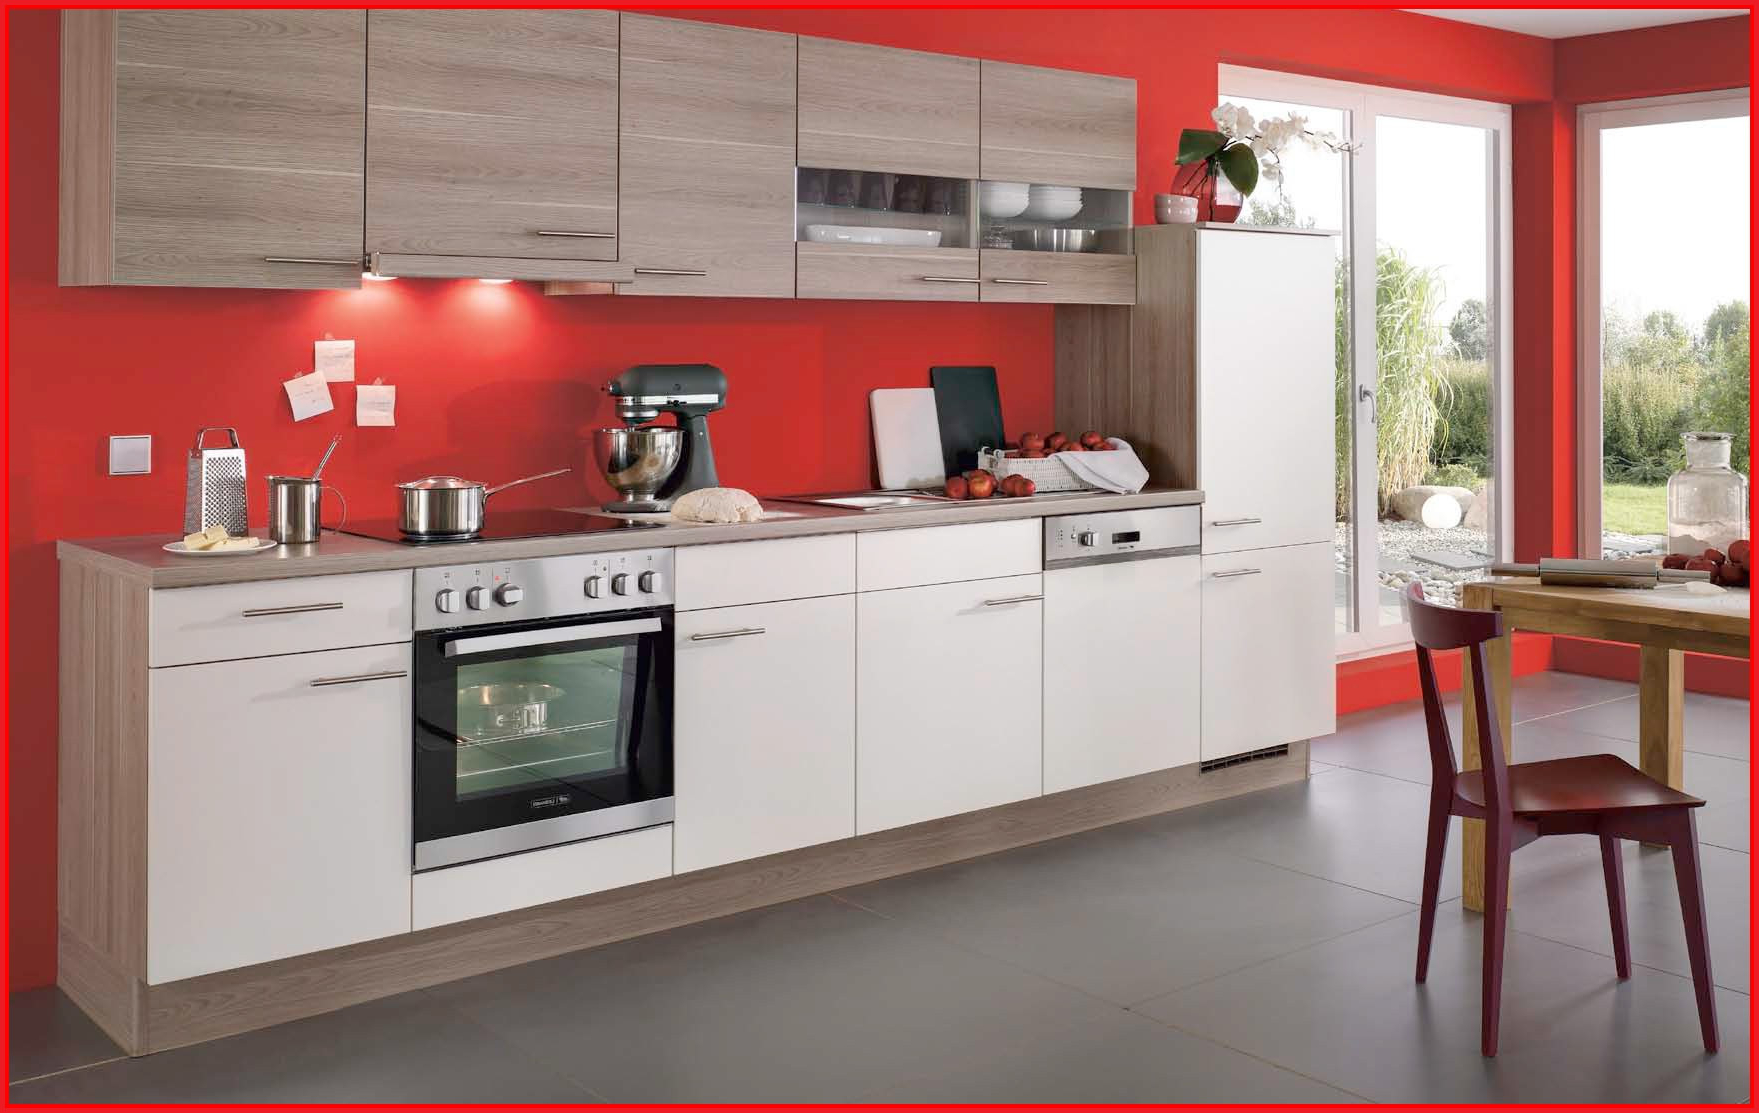 Armarios De Cocina Baratos Q5df Armarios De Cocina Baratos Armarios Para Cocina Muebles De